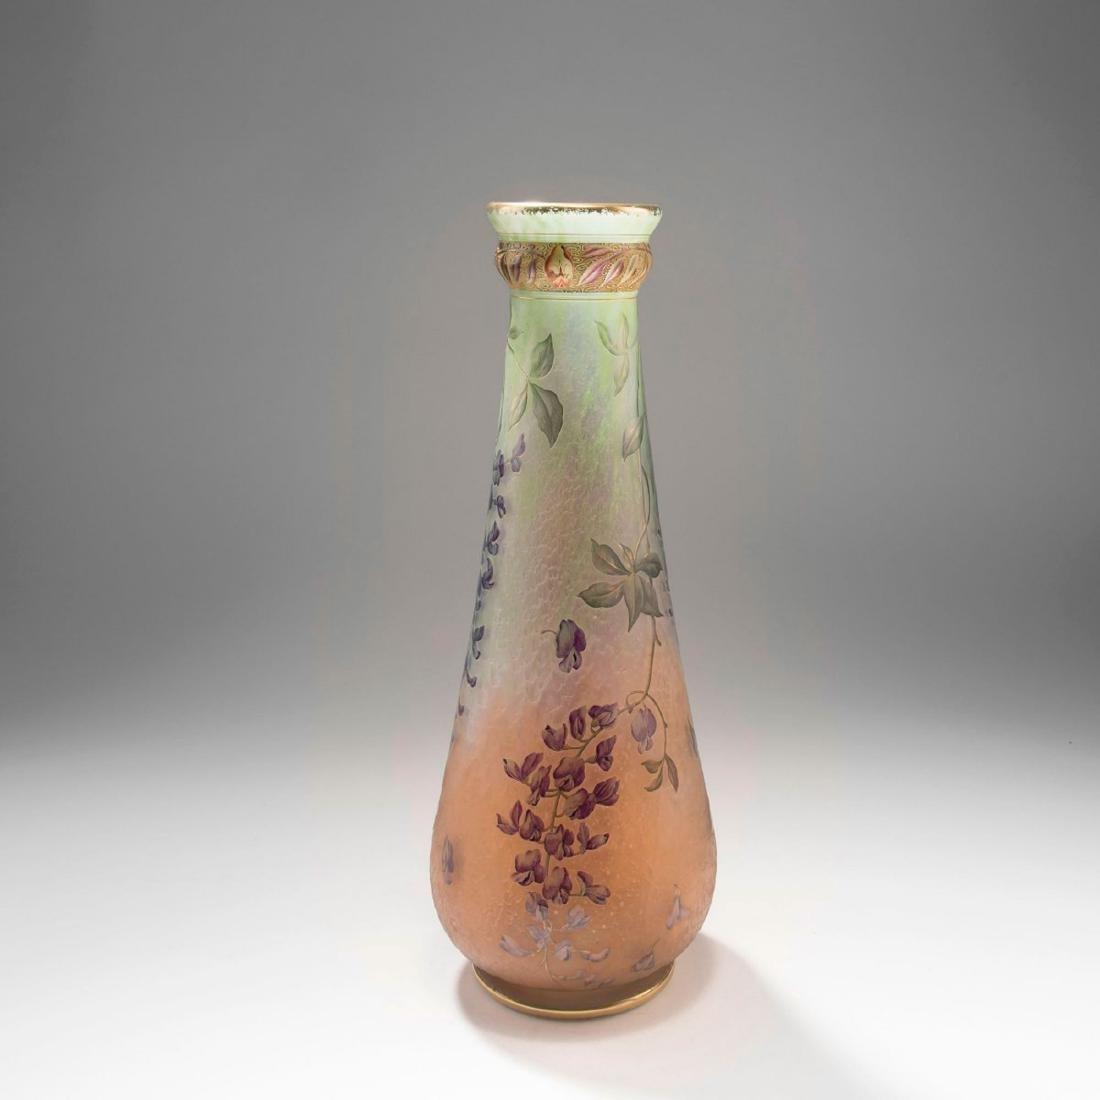 Tall 'Glycines' vase, 1895-1900 - 3